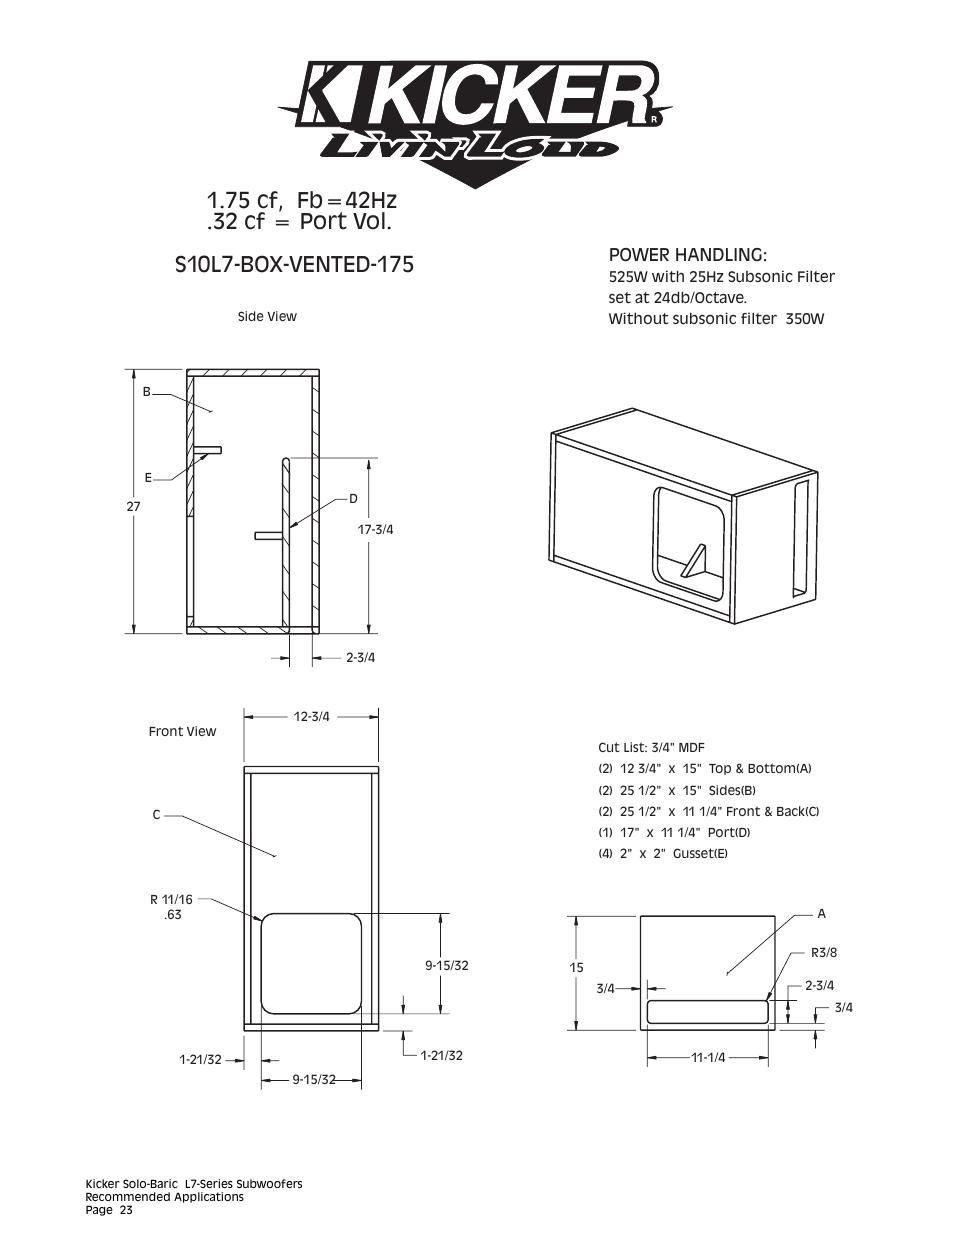 Power handling | Kicker L7 User Manual | Page 23 / 36